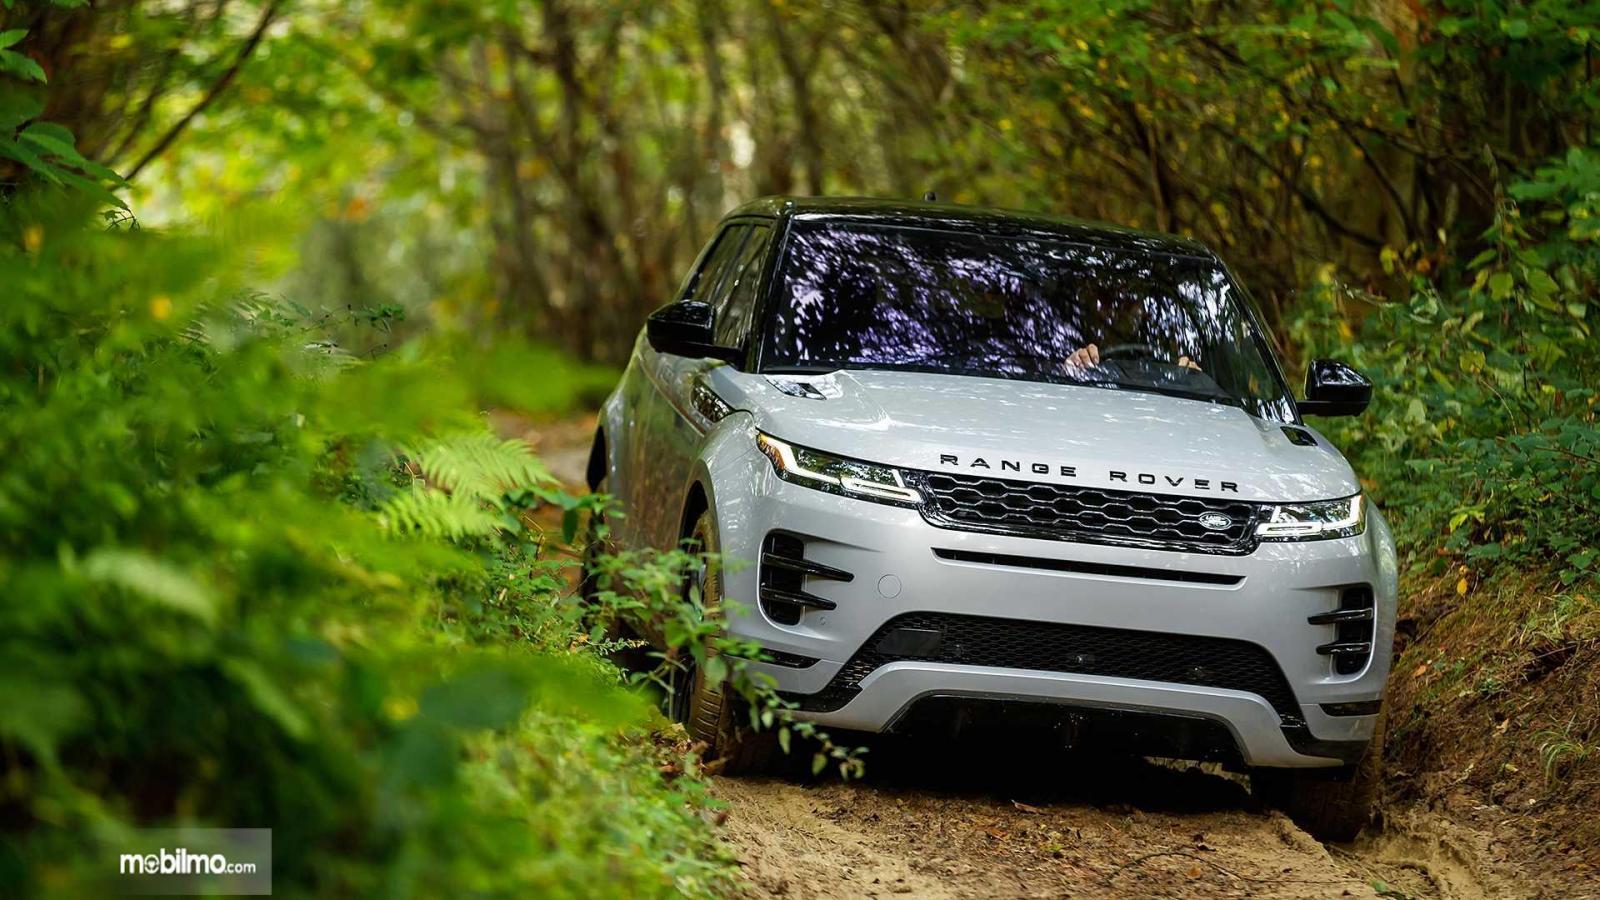 Gambar pengendaraan off-road Land Rover Range Rover 2019